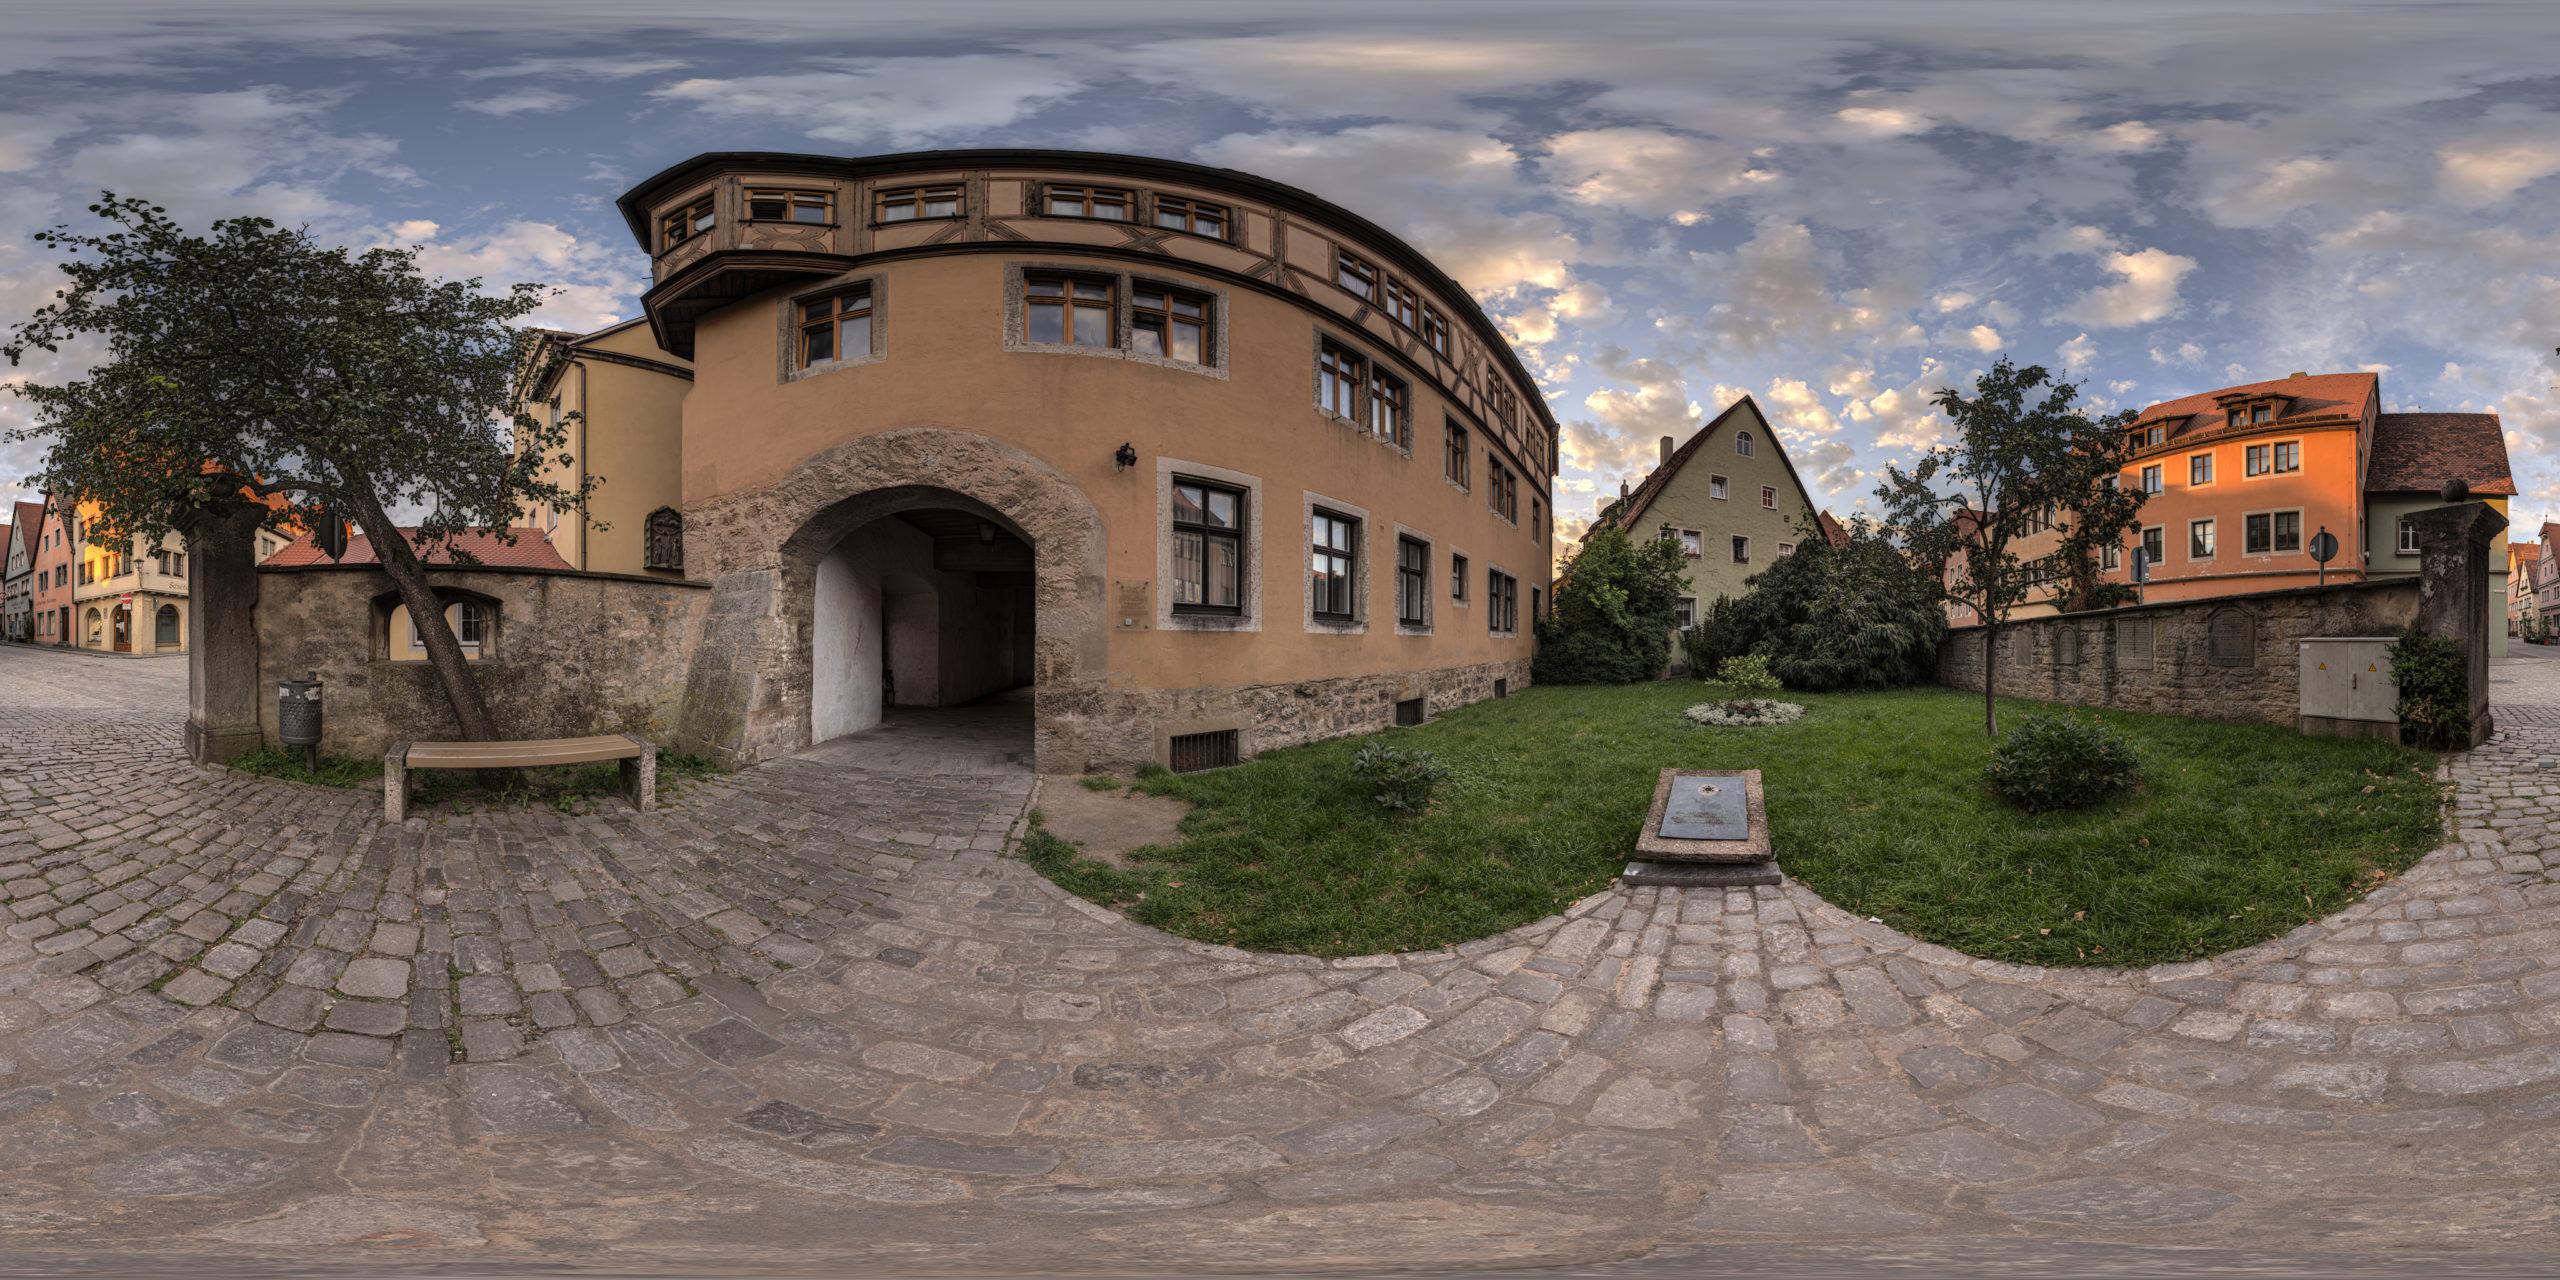 HDRI-Skies-Jewish-Remembrance-Rothenburg-Ob-Der-Tauber